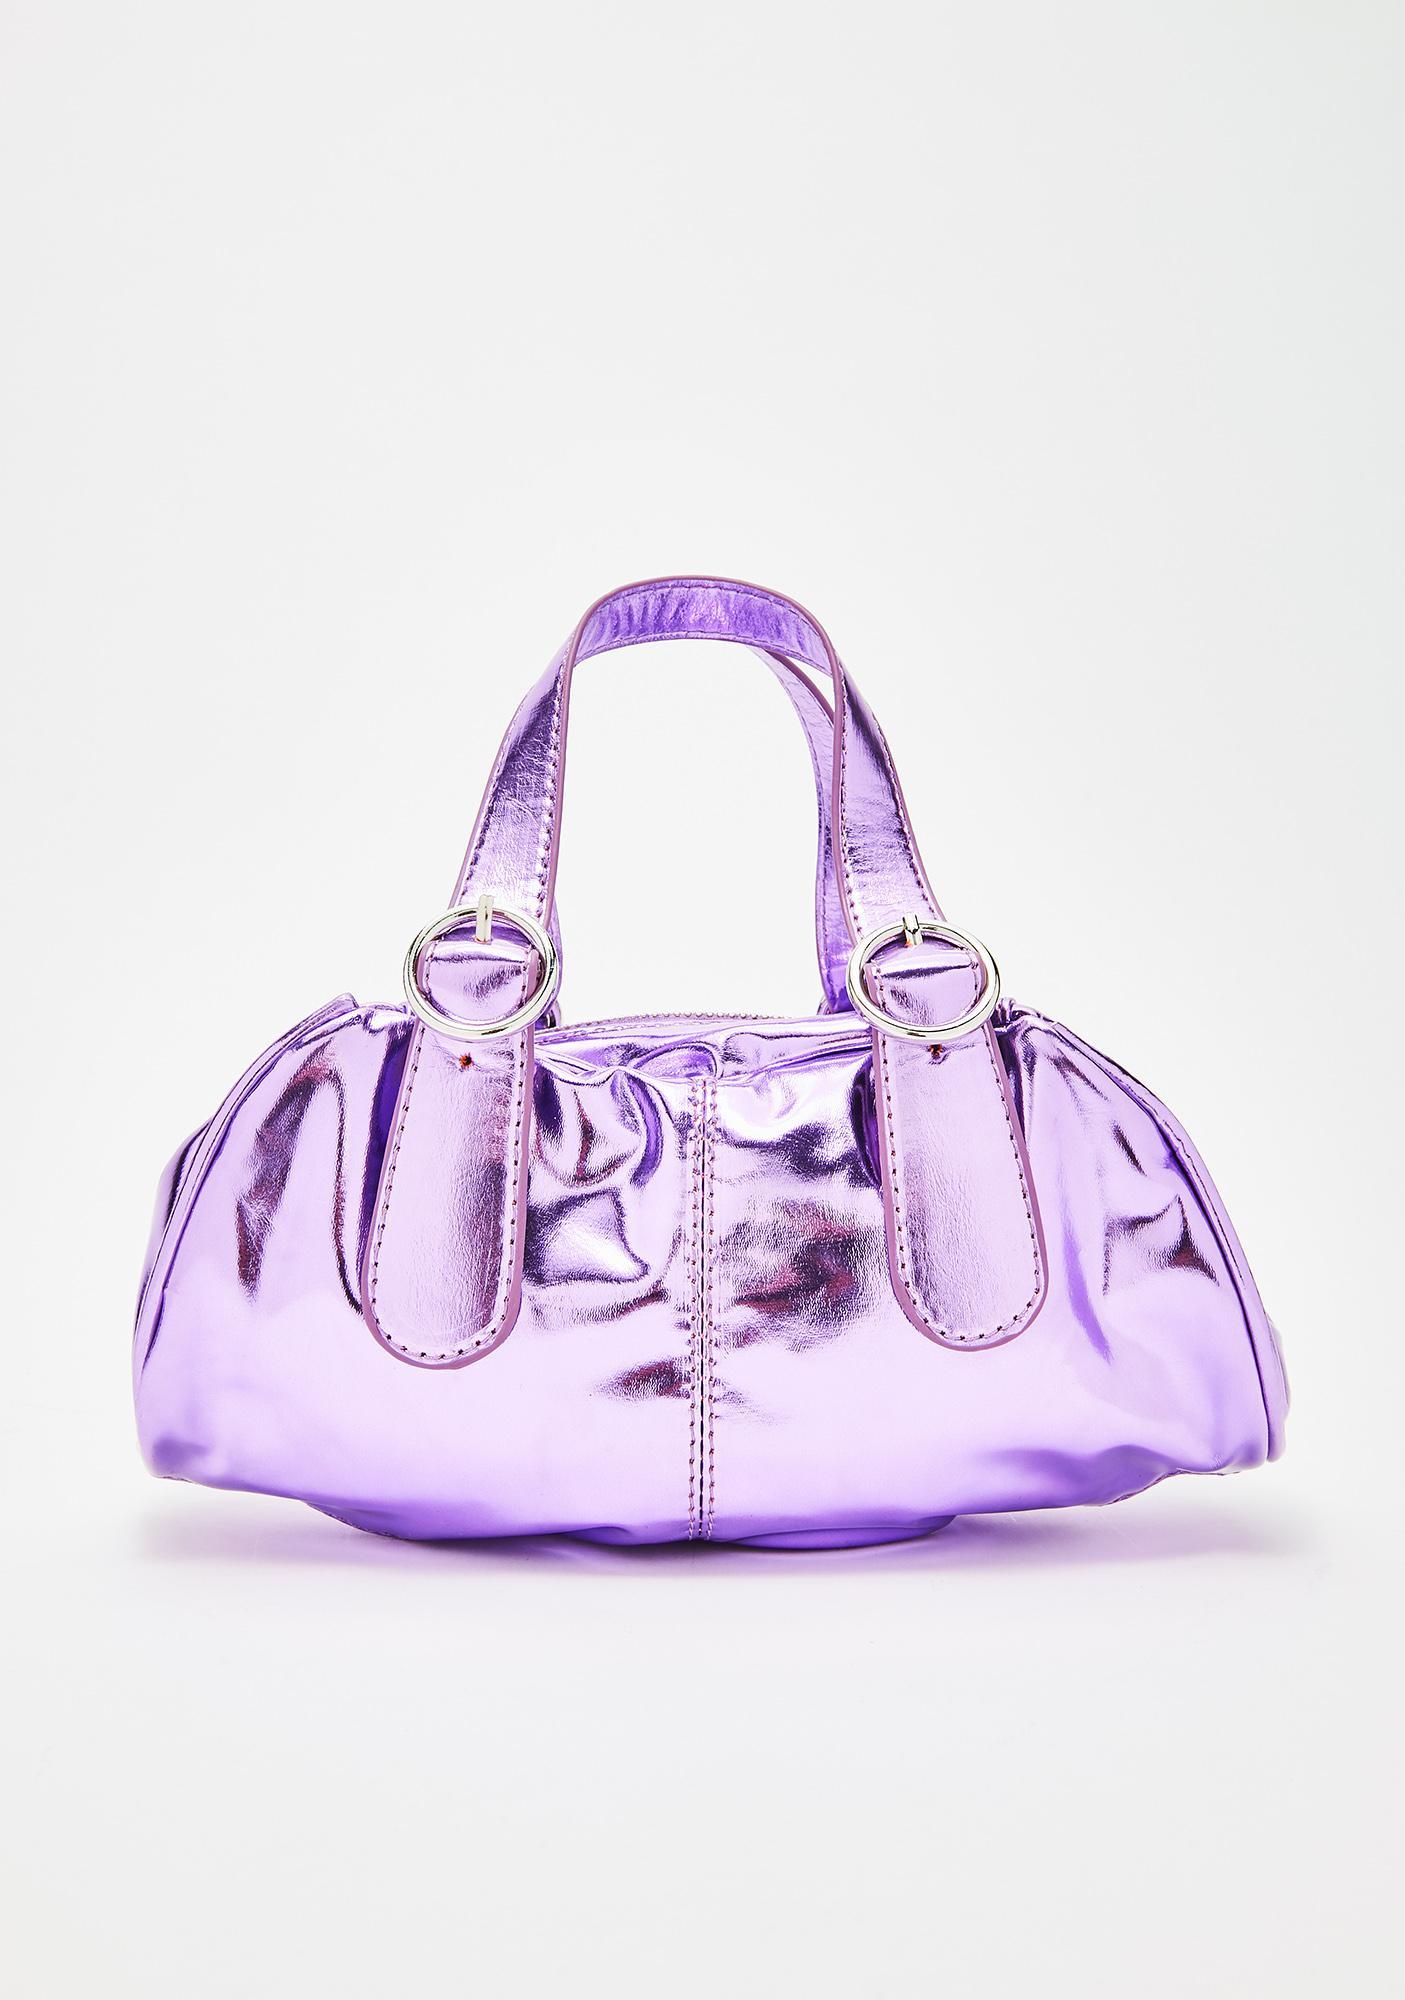 Sugar Thrillz The Spoiled Life Metallic Bag